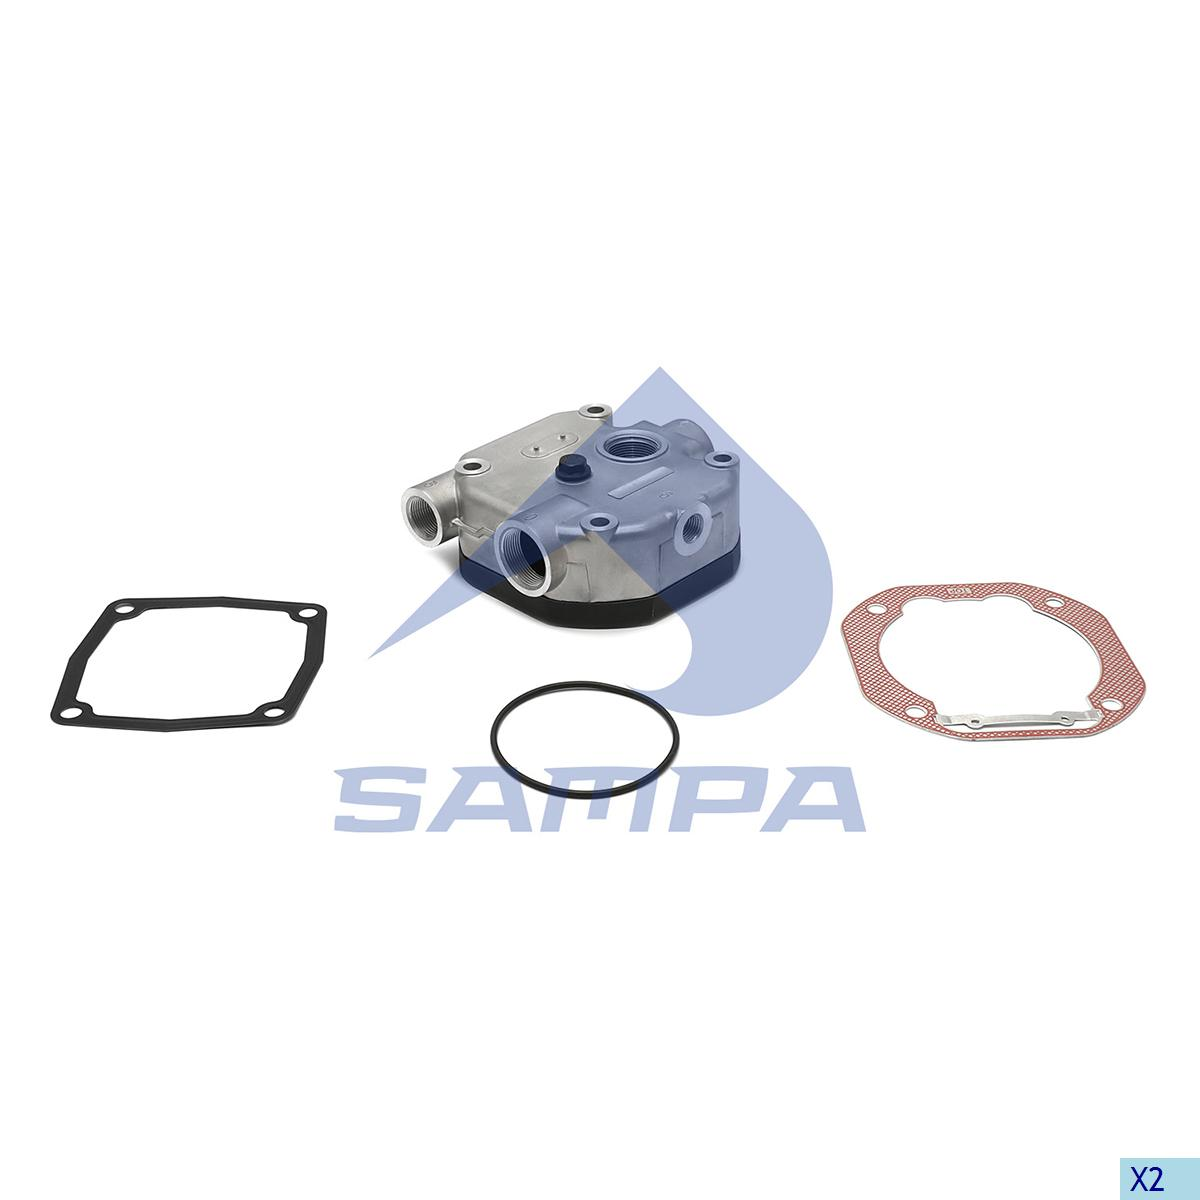 Cylinder Head, Mercedes, Compressed Air System